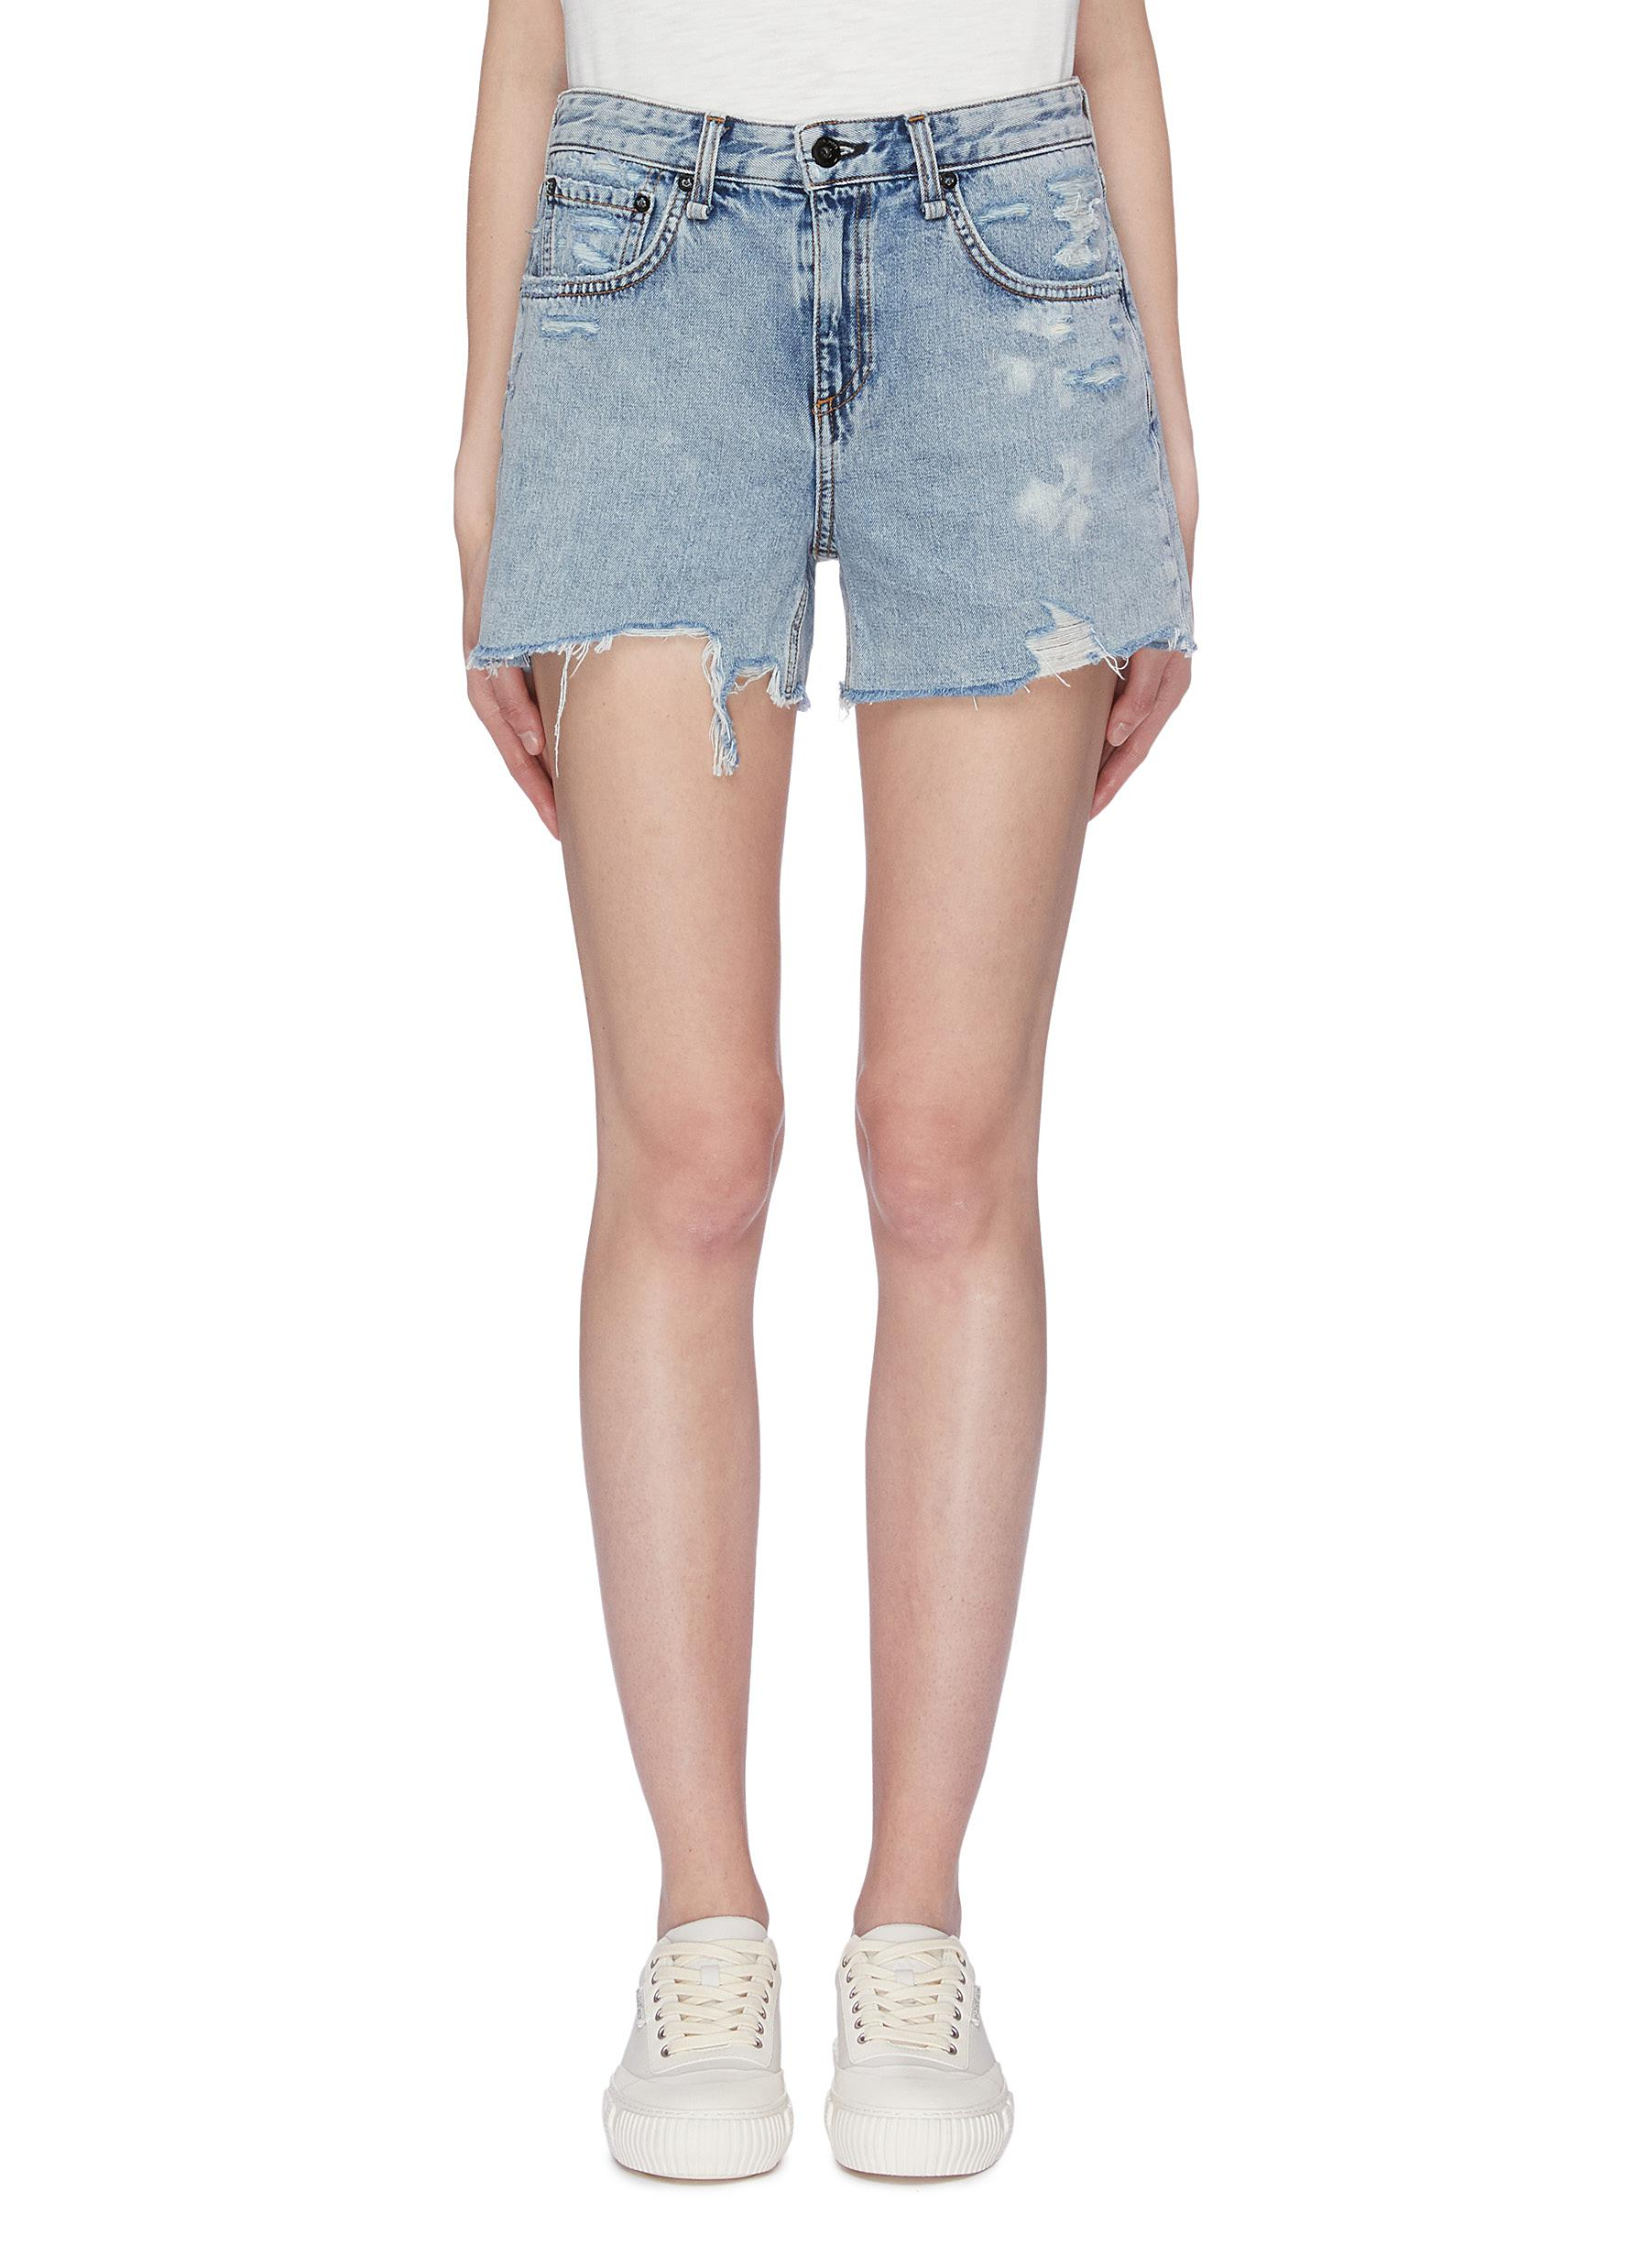 Dre distressed boyfriend denim shorts by Rag & Bone/Jean